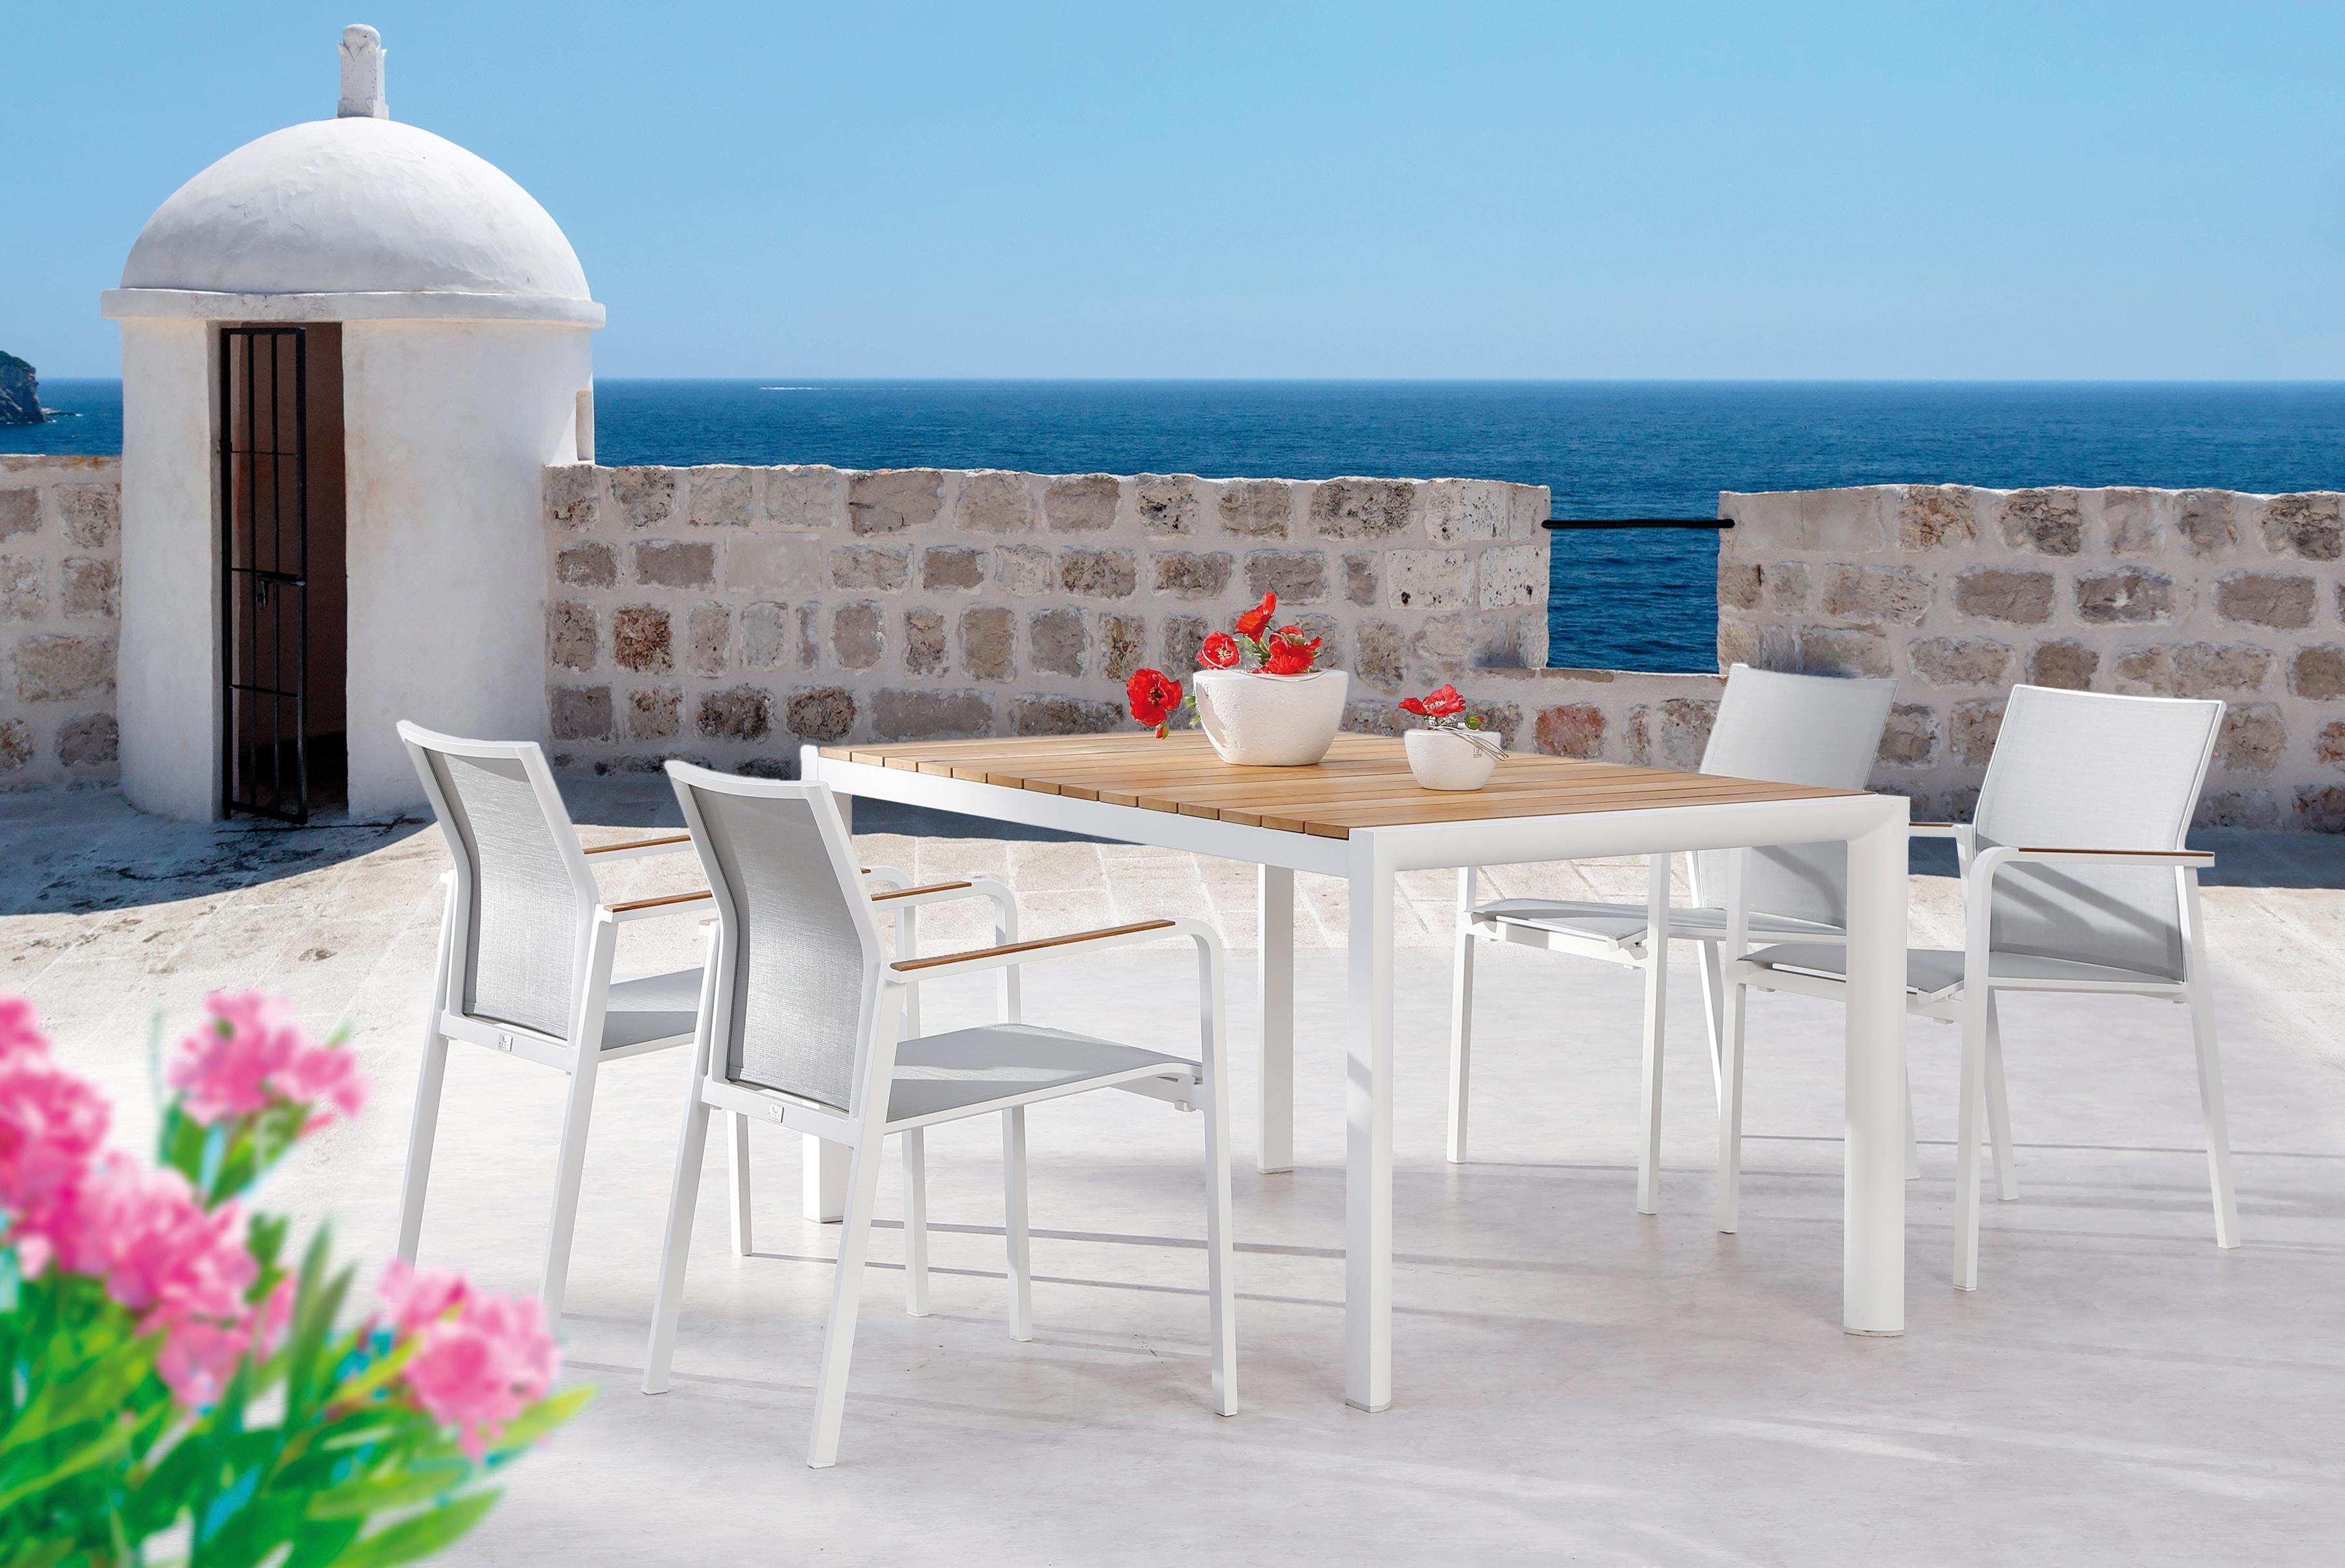 BEST Gartenmöbelset Paros 5-tlg 4 Sessel Tisch 160x90 cm stapelbar Teak/Ergotex